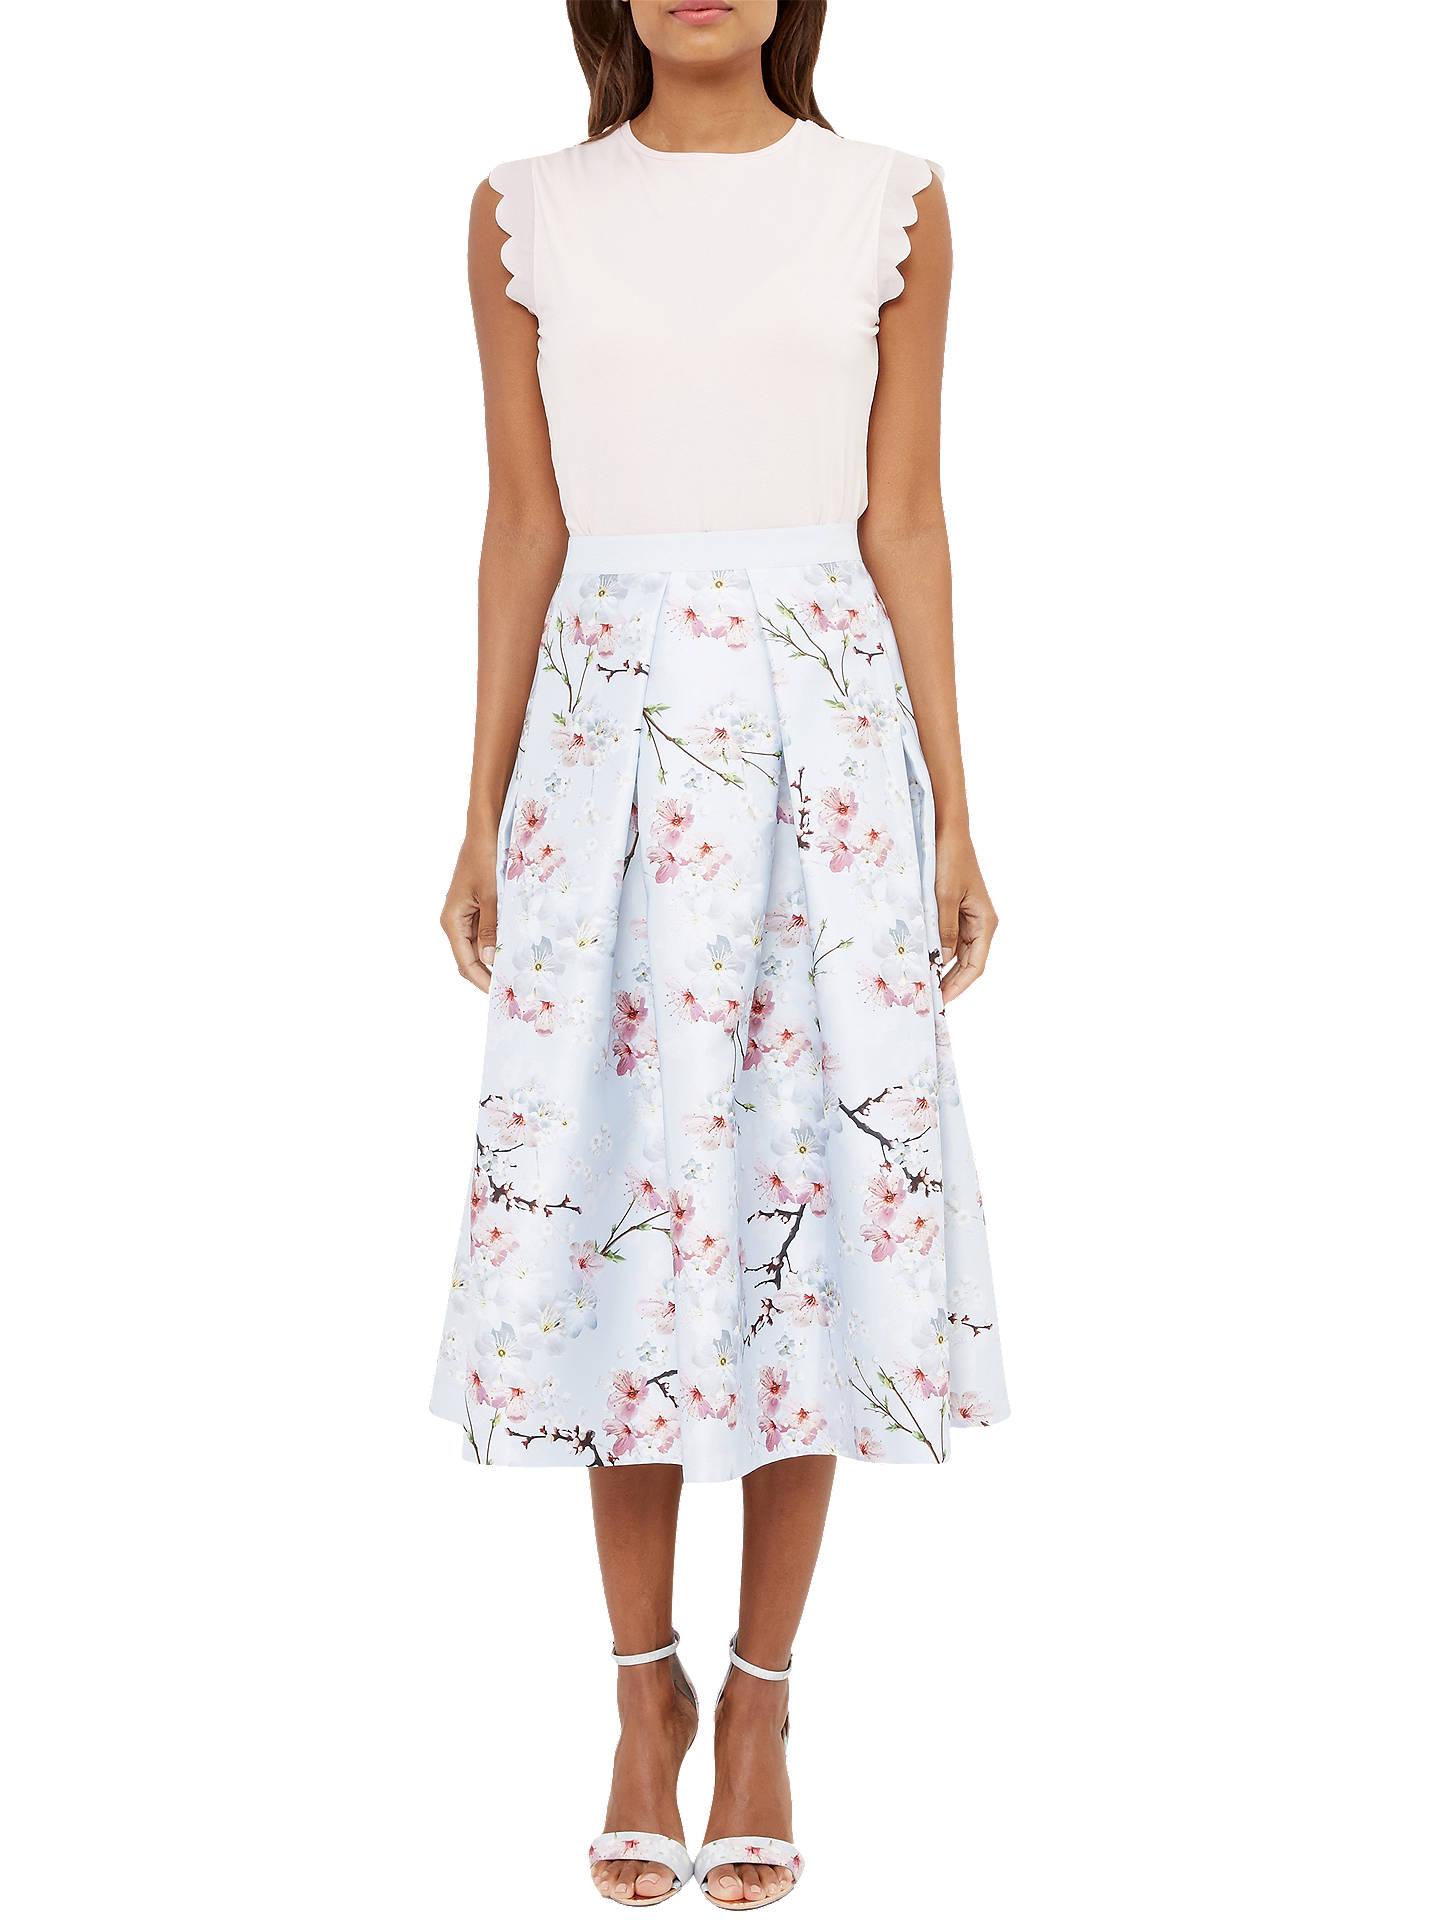 0ffbe2508e7bfc Buy Ted Baker Pallye Oriental Blossom Midi A-Line Skirt